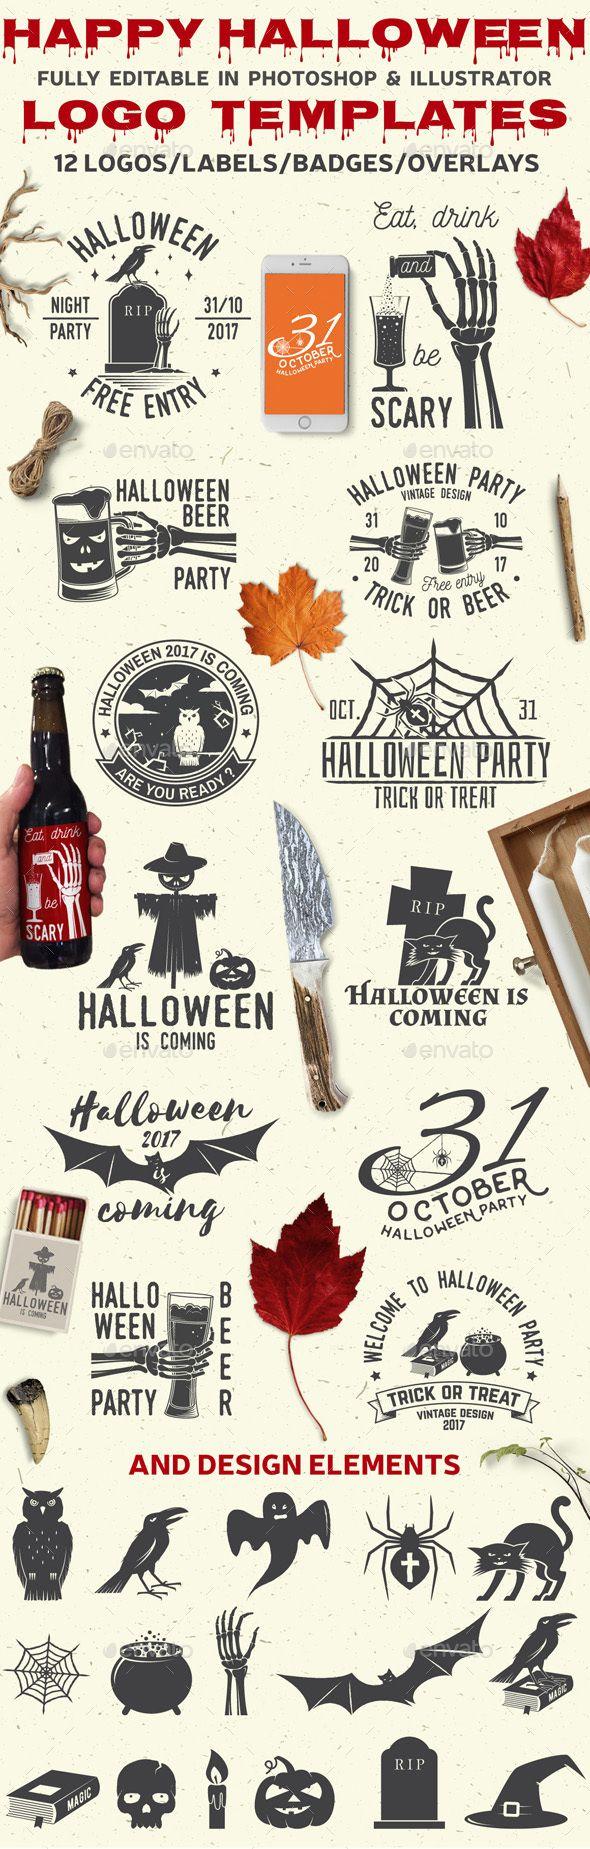 Happy Halloween Logo Template PSD, Transparent PNG, Vector EPS, AI Illustrator